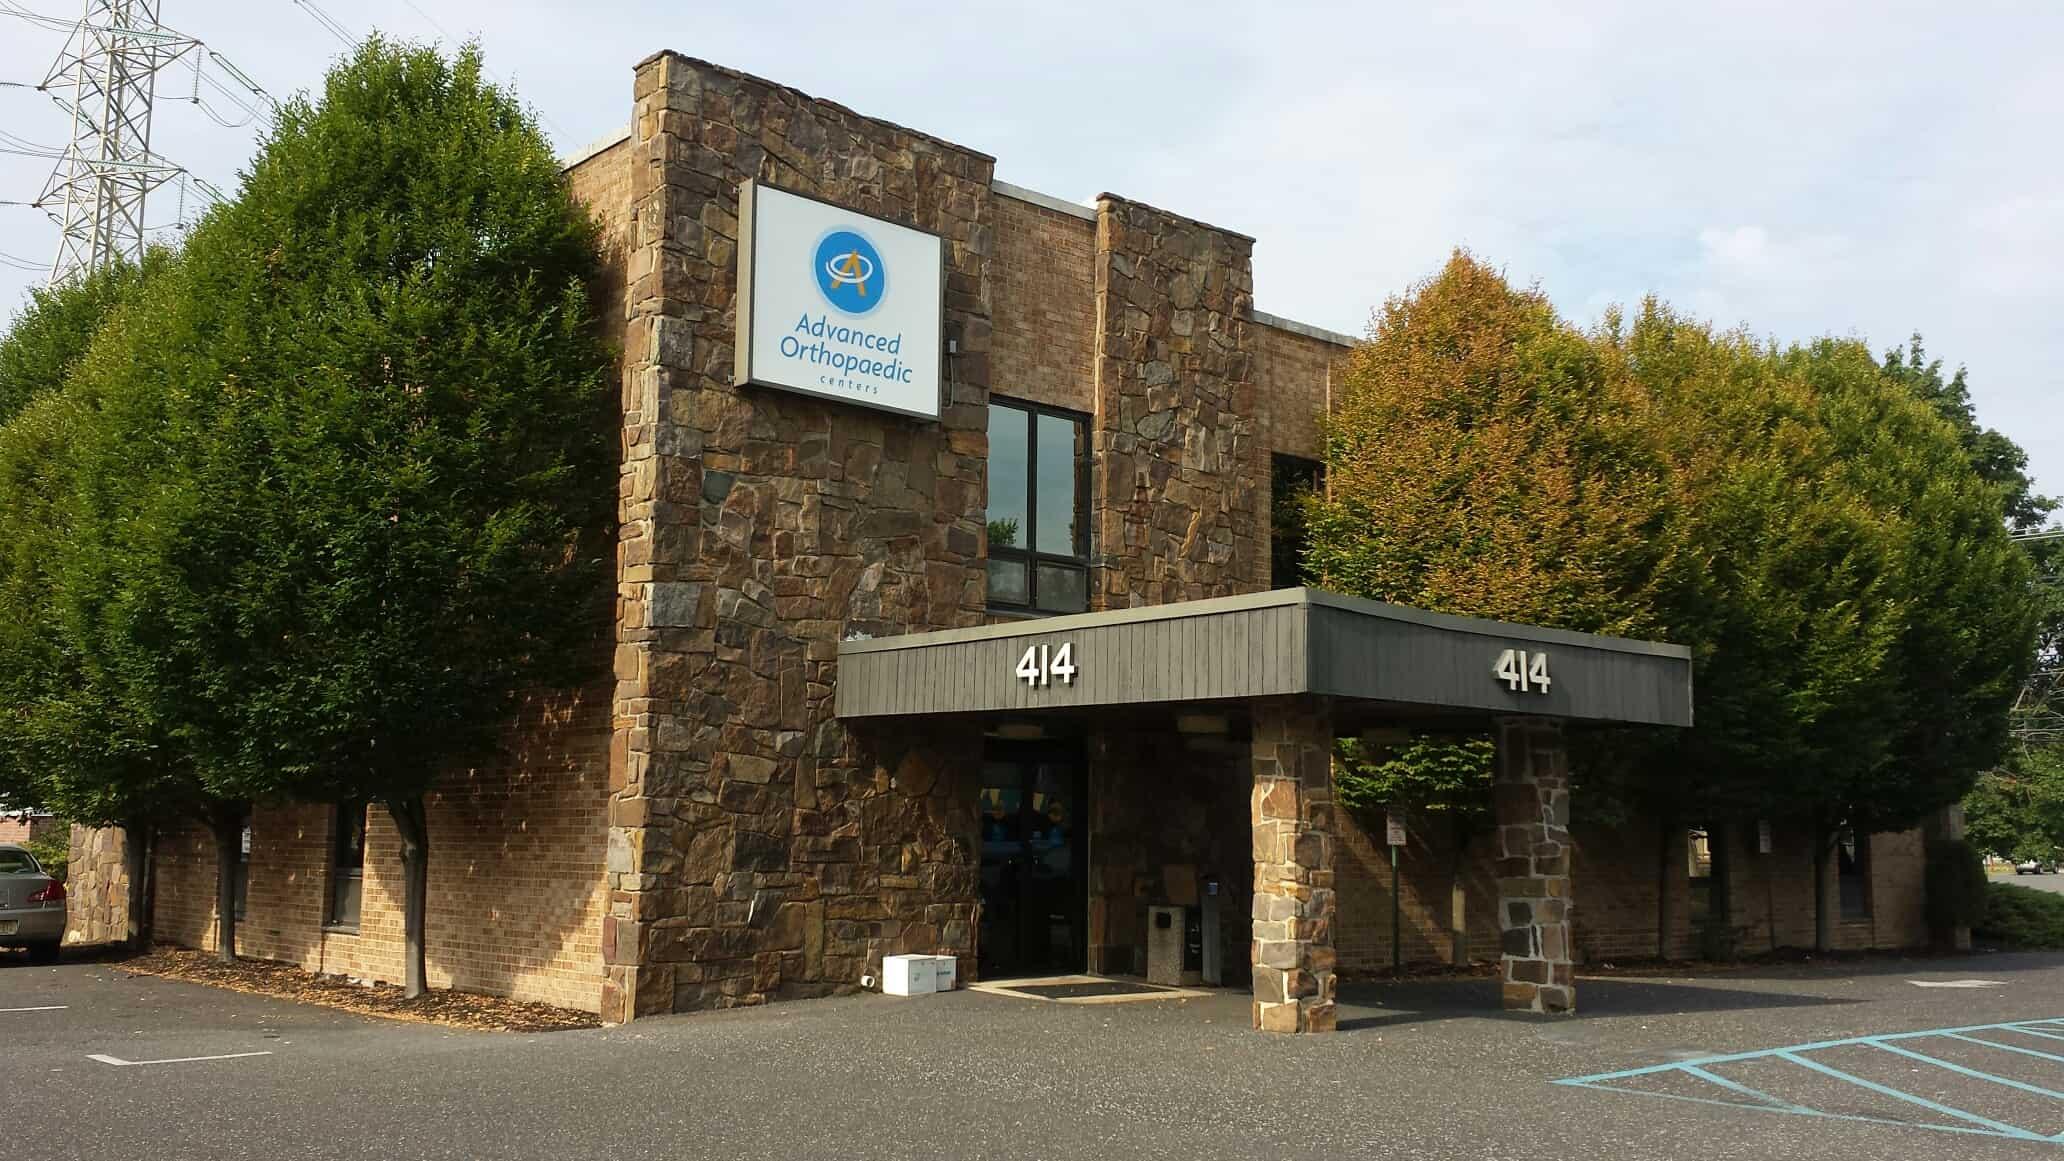 Woodbury Advanced Orthopaedic Centers